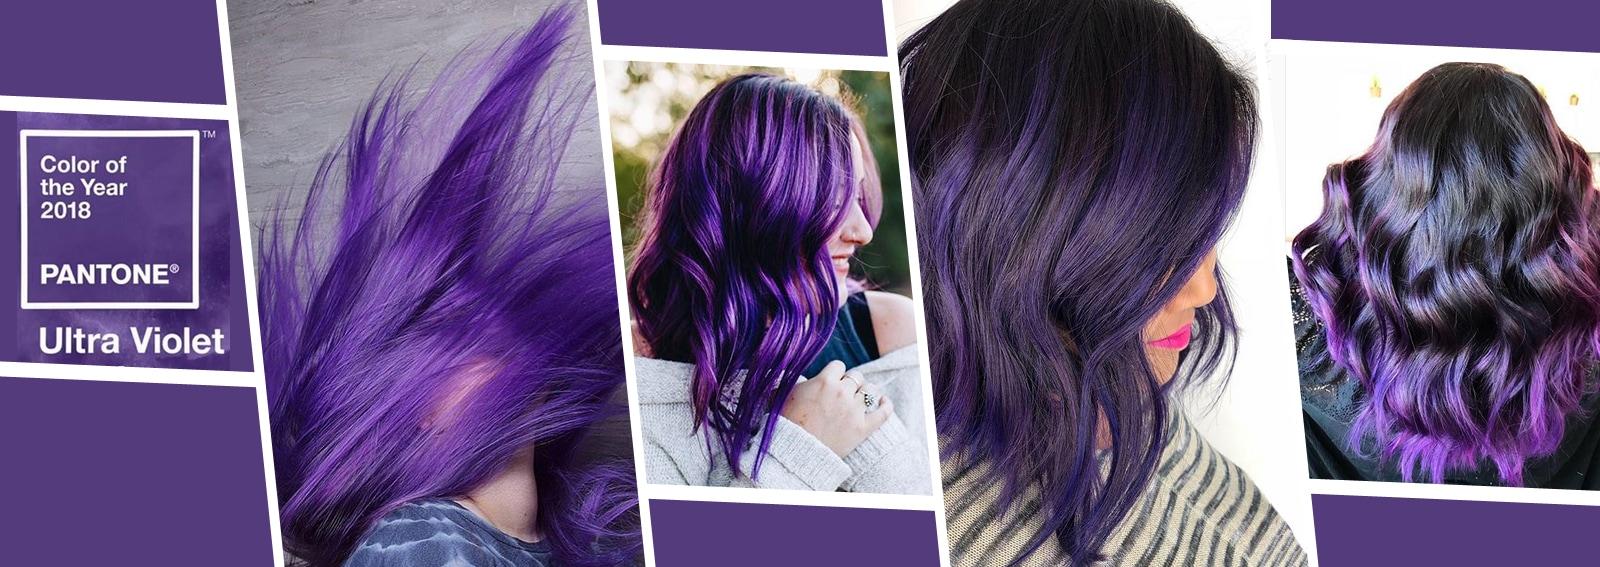 Ultra Violet hair i capelli viola 2018 nel colore Pantone DESKTOP_ultraviolet